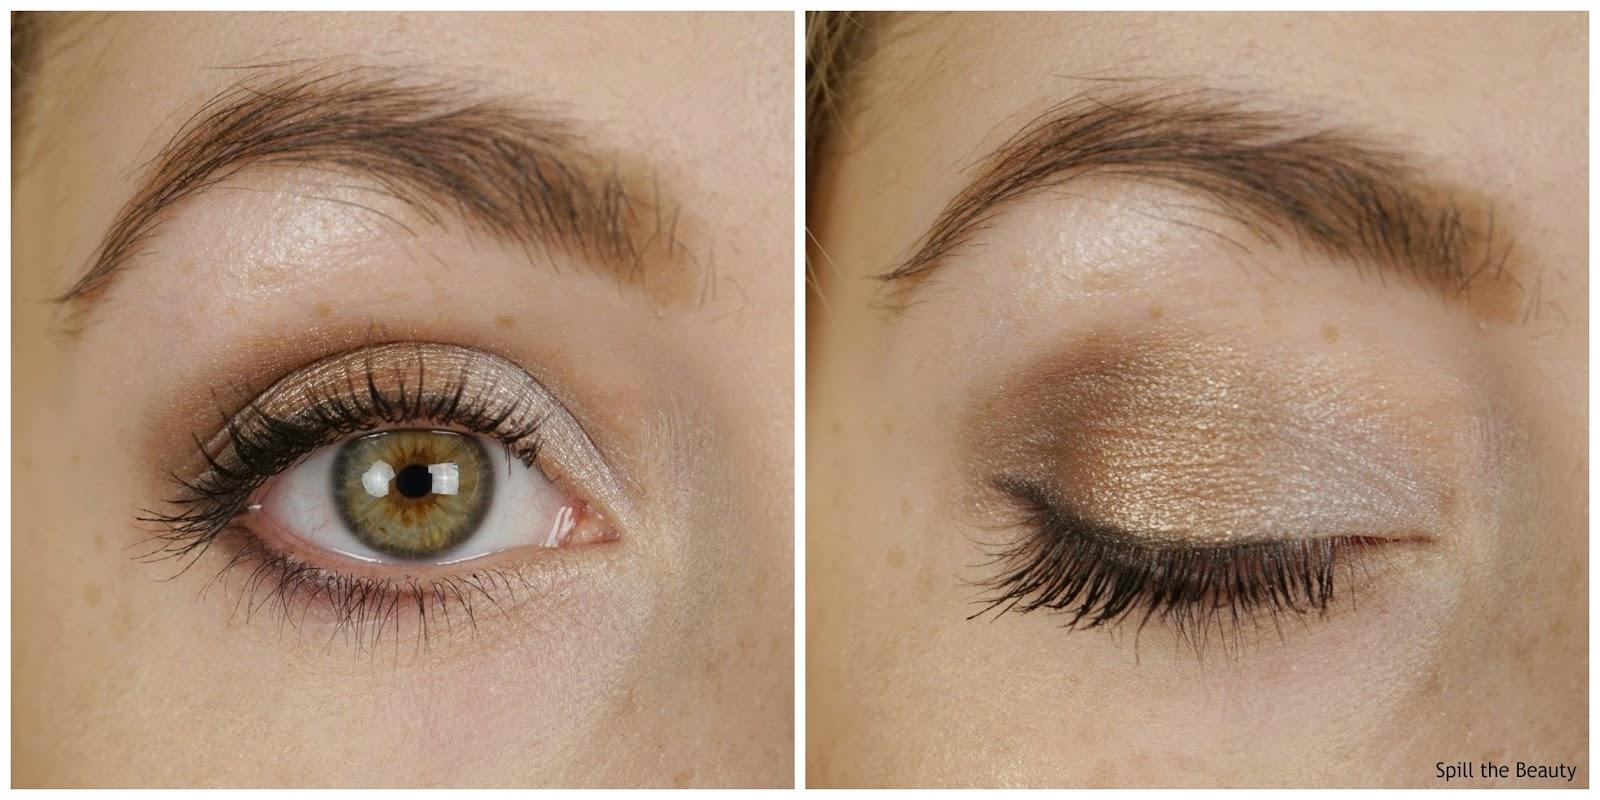 dior holiday makeup 2016 10 review swatch 5 couleurs splendor palette smoky sequins